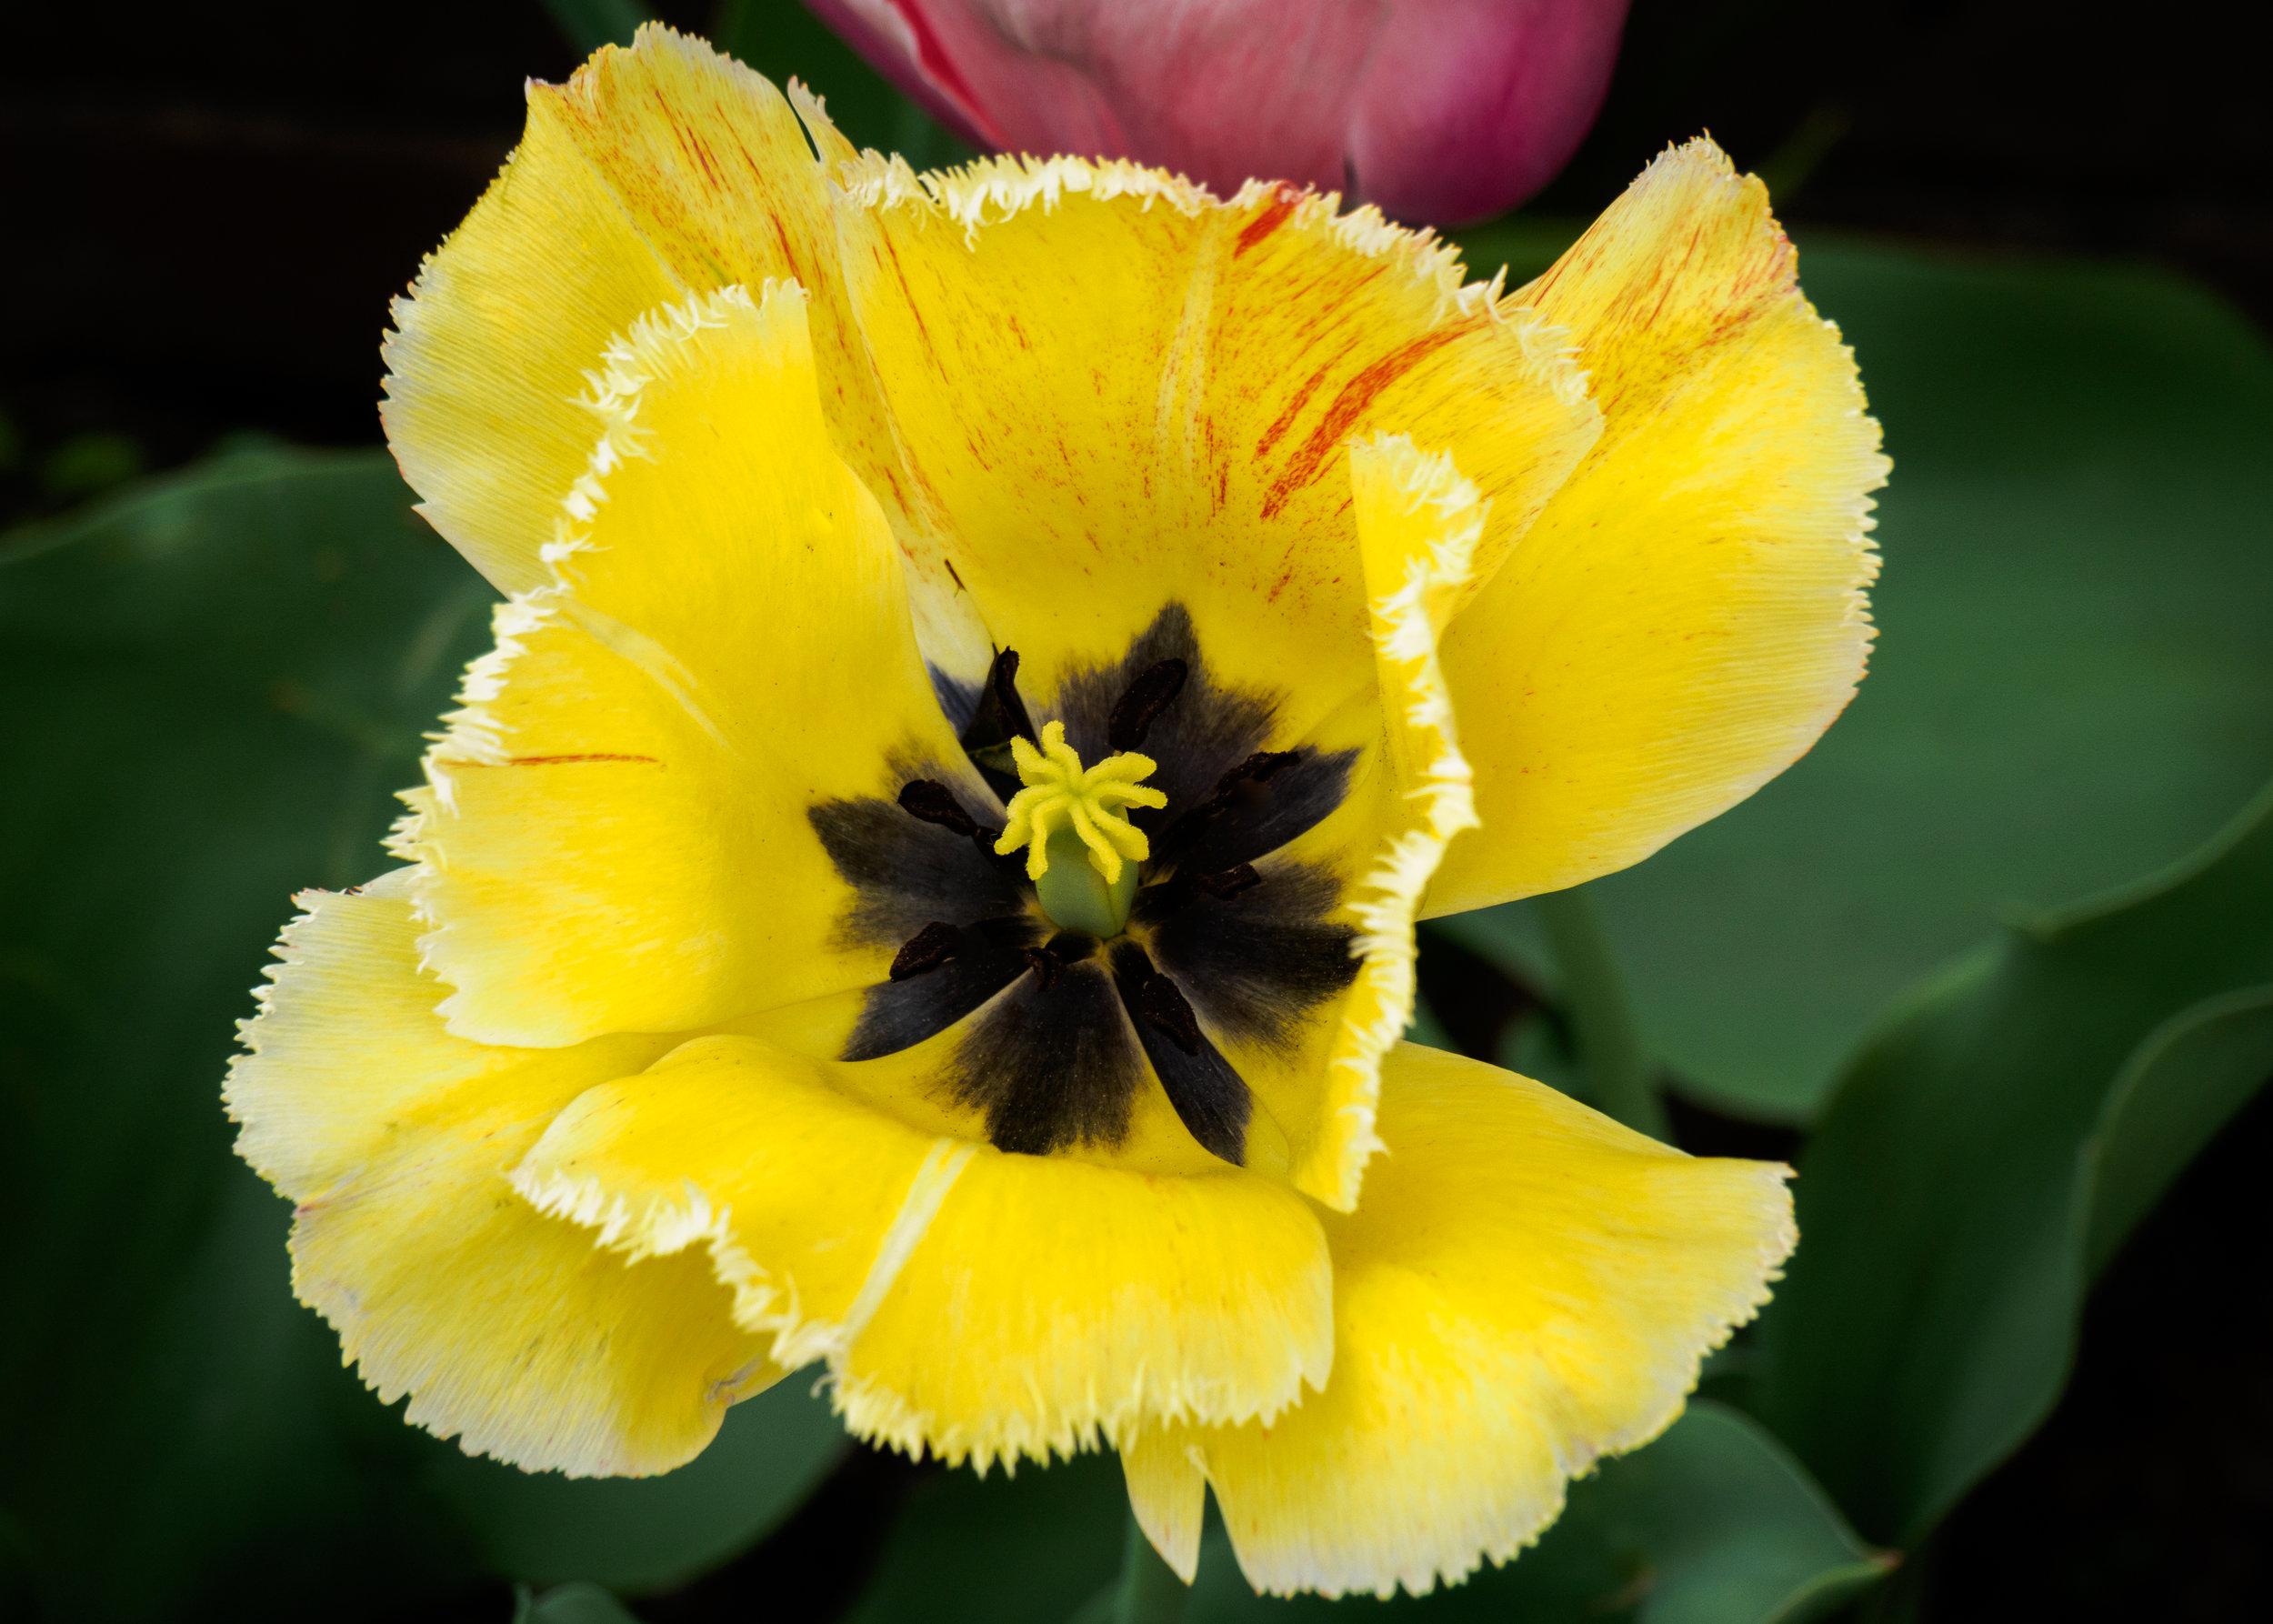 20160422-Fringed Yellow Tulip-MLS0268.jpg